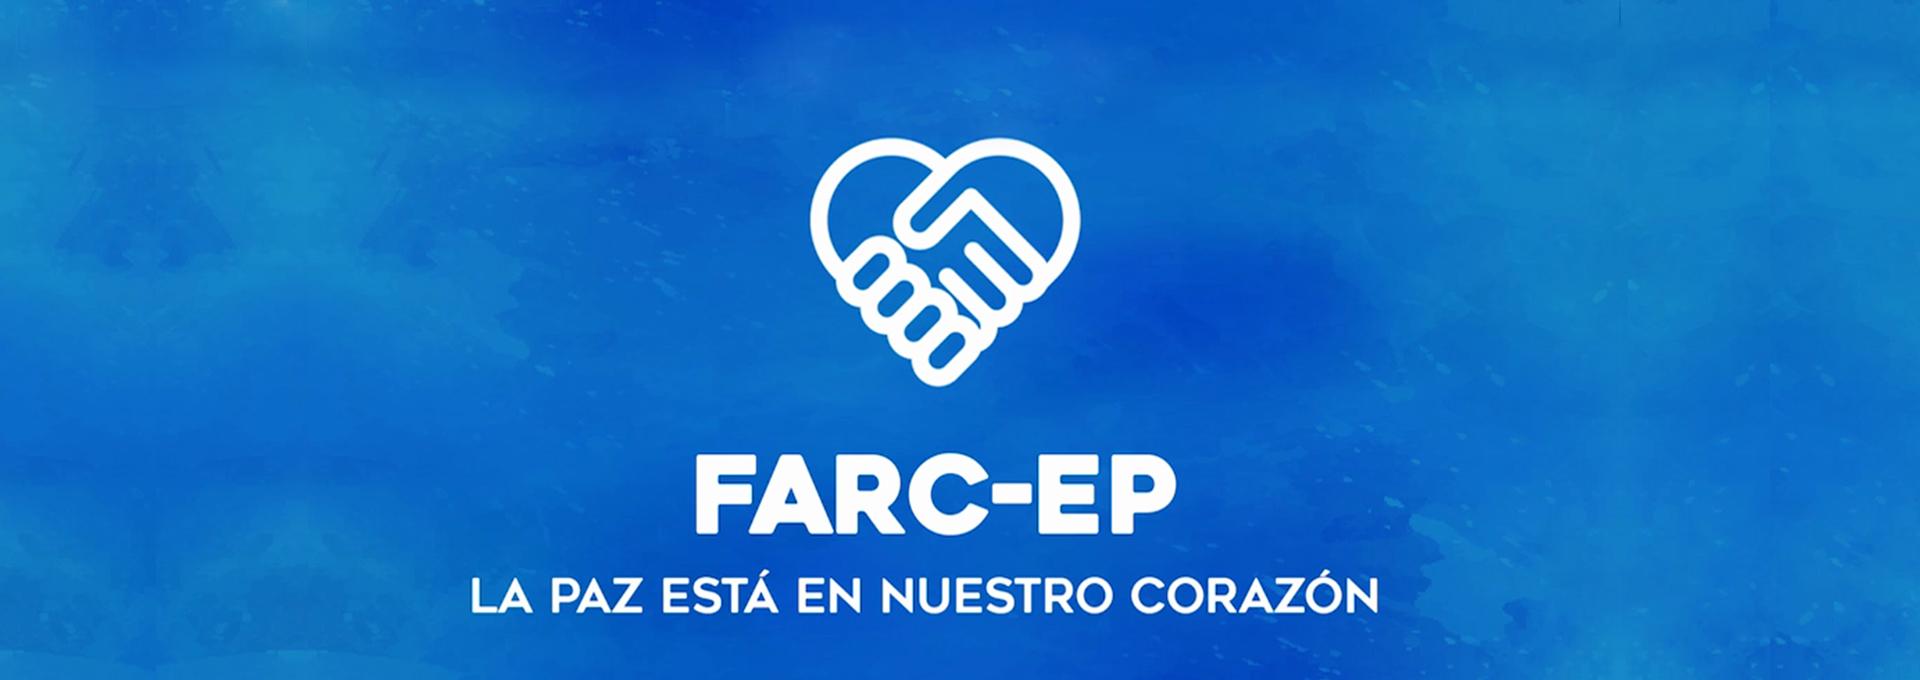 New FARC logo